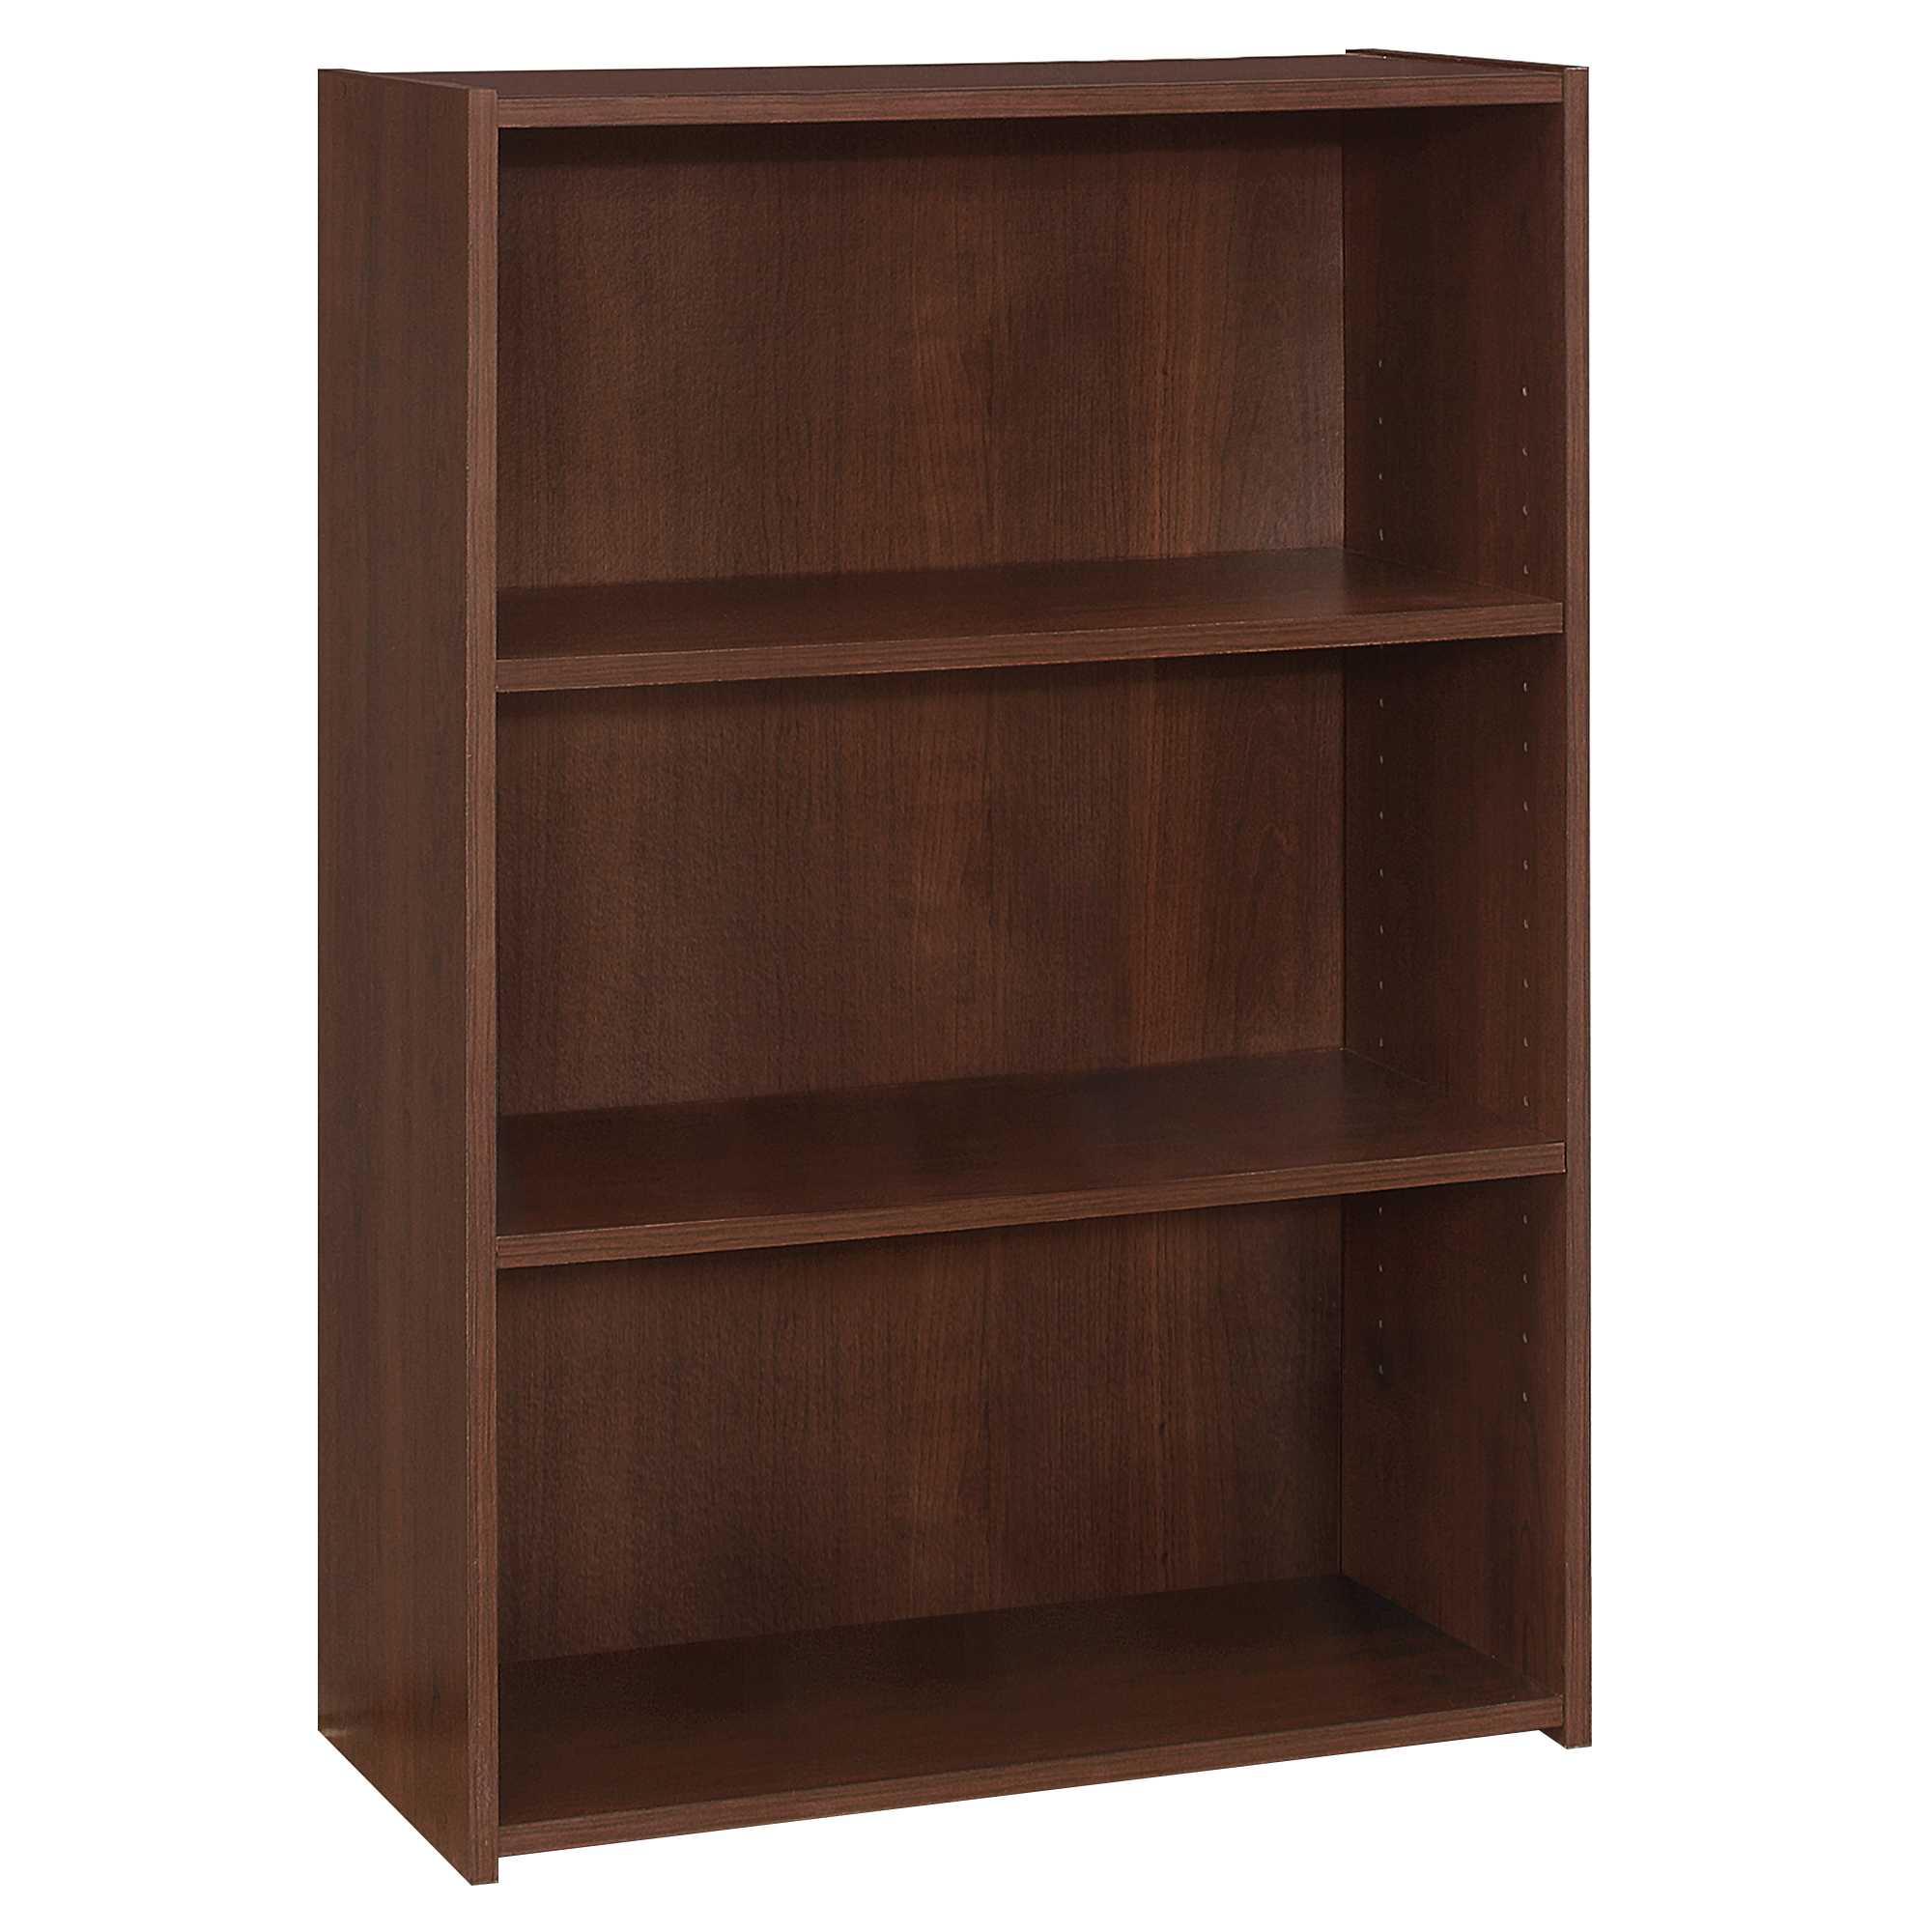 "11.75"" x 24.75"" x 35.5"" Cherry 3 Shelves  Bookcase"